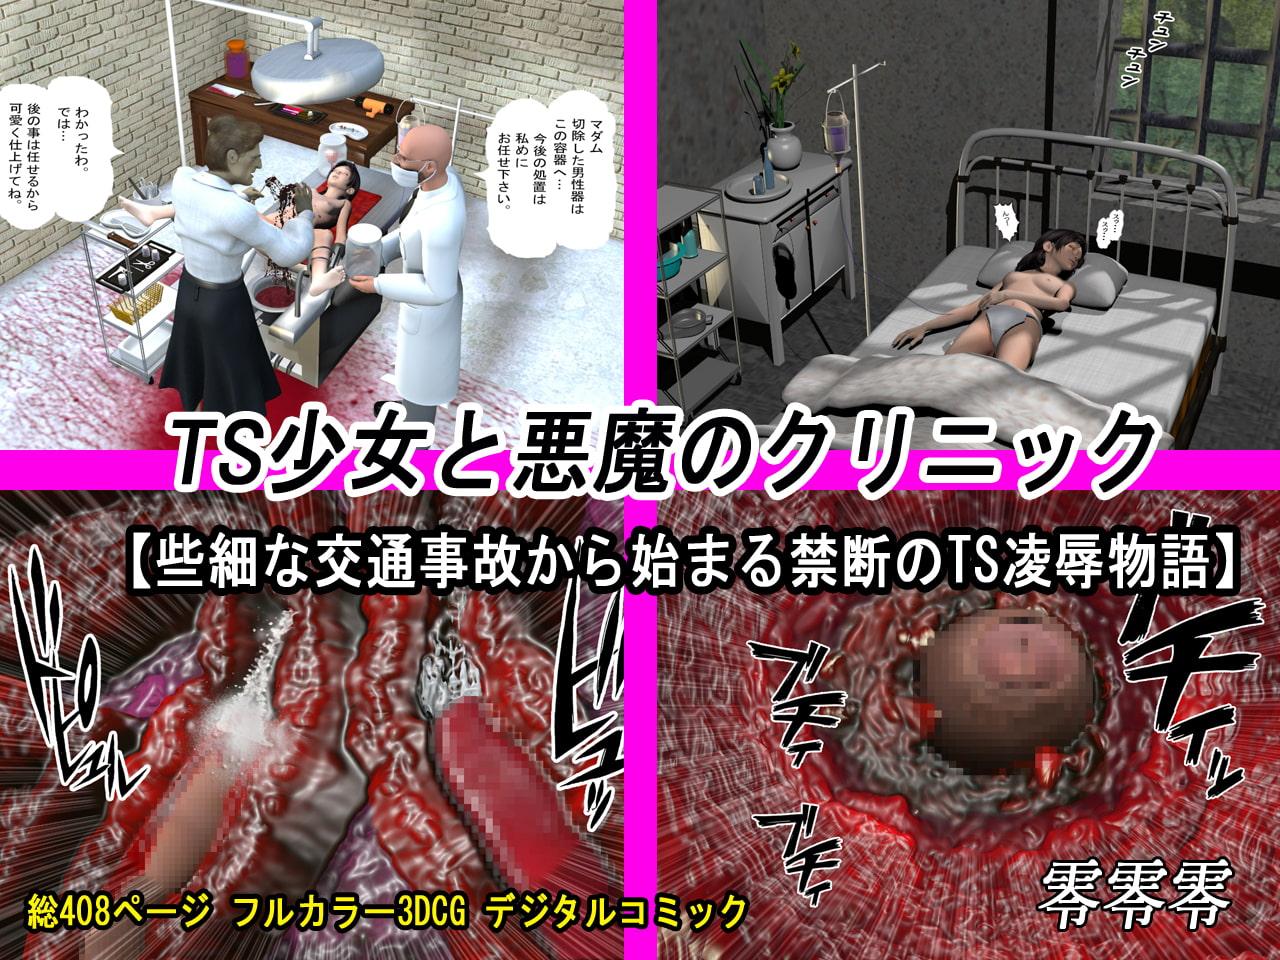 TS少女と悪魔のクリニック (些細な交通事故から始まる禁断のTS凌辱物語)のサンプル画像4